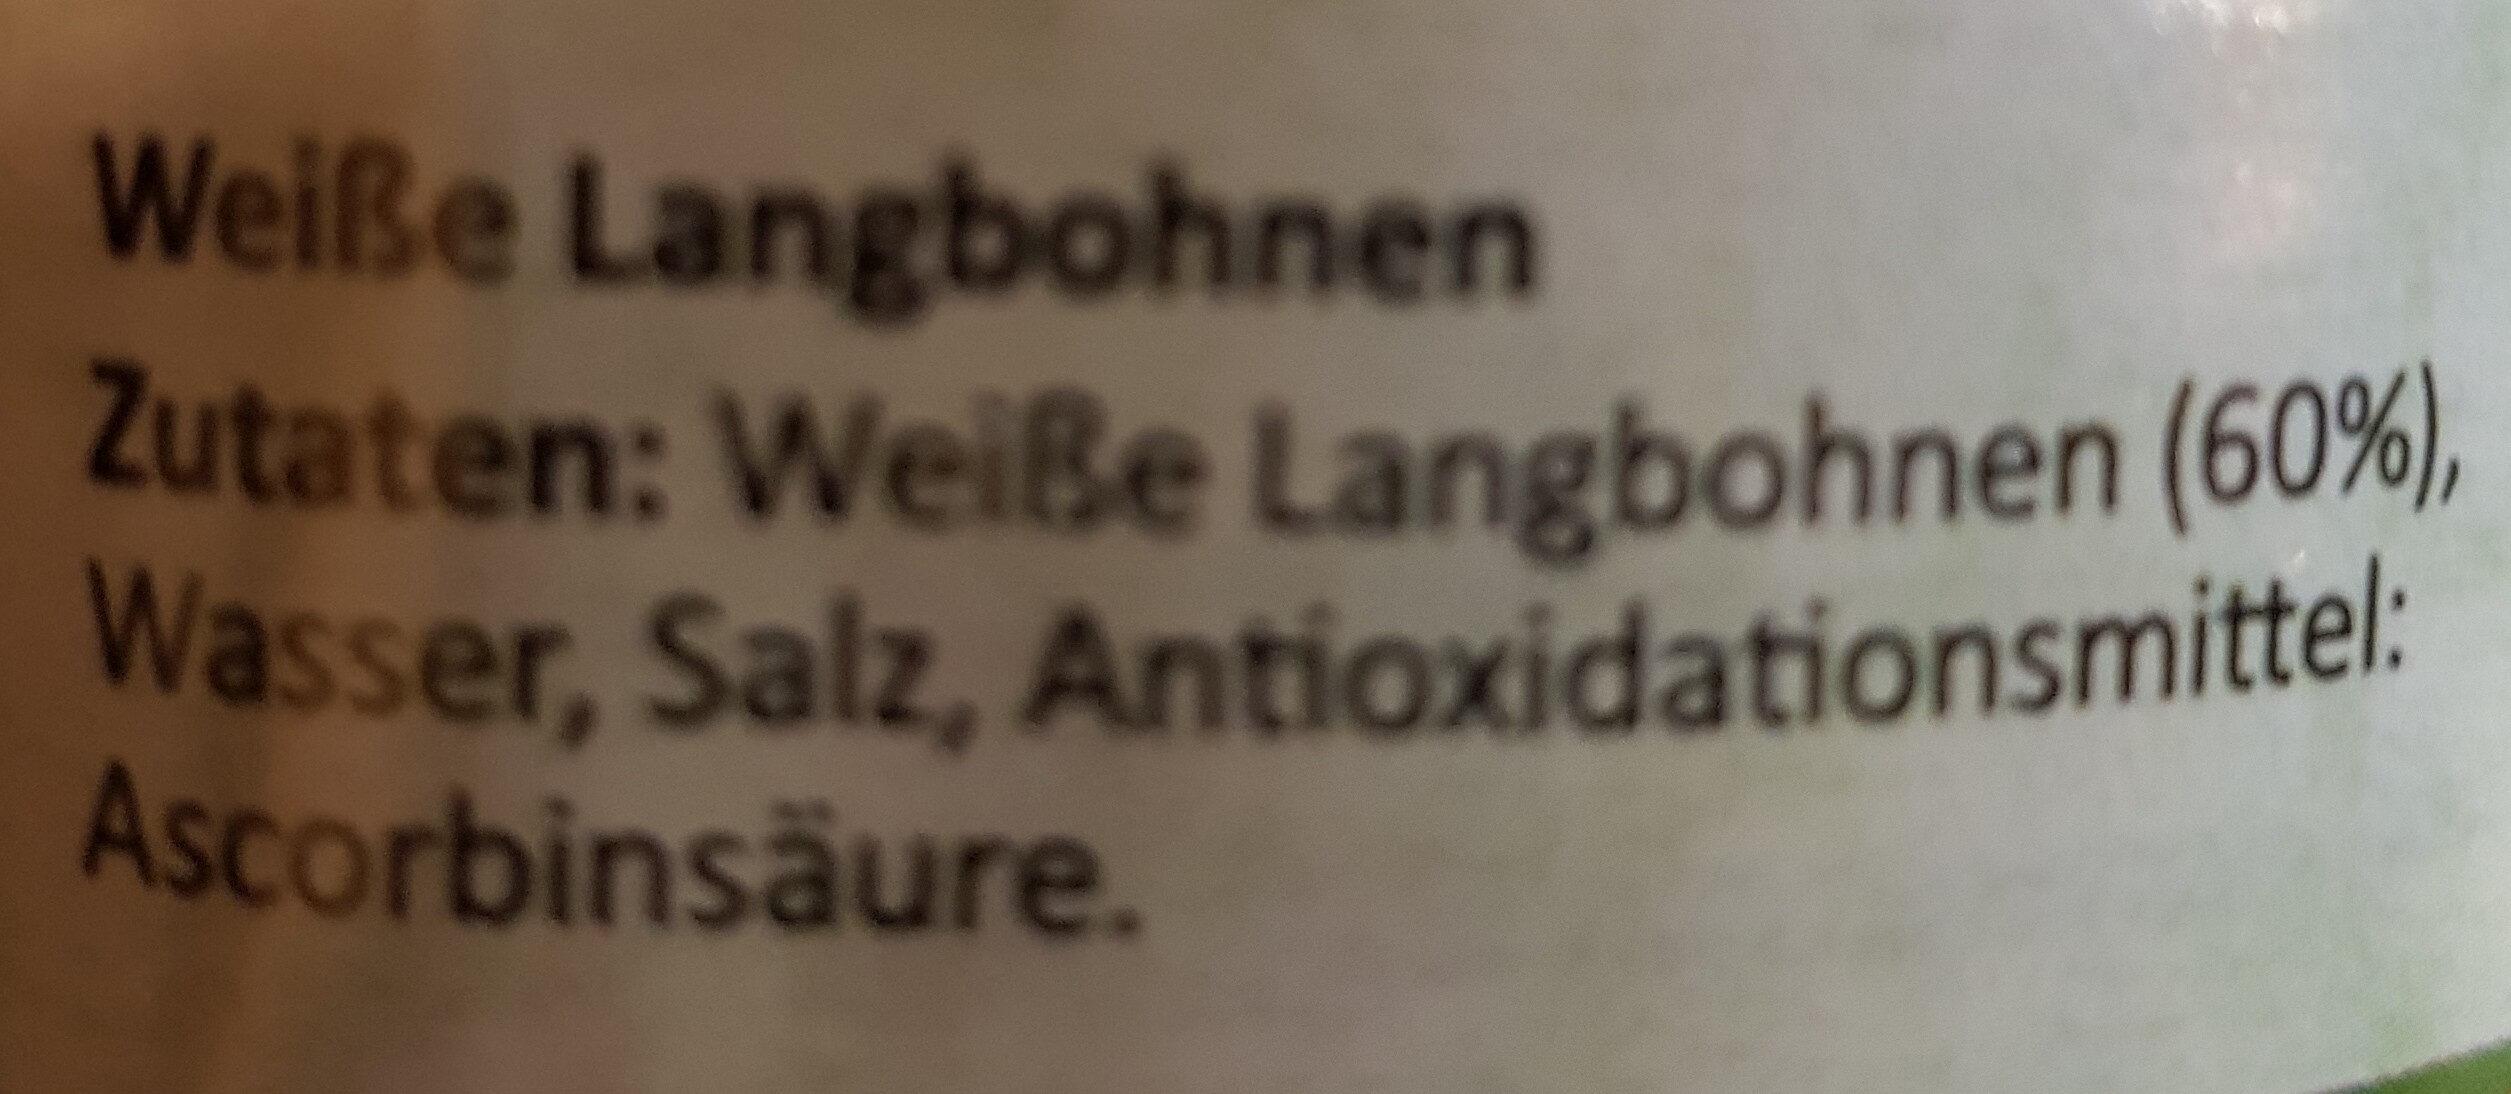 Weiße Langbohnen - Ingrediënten